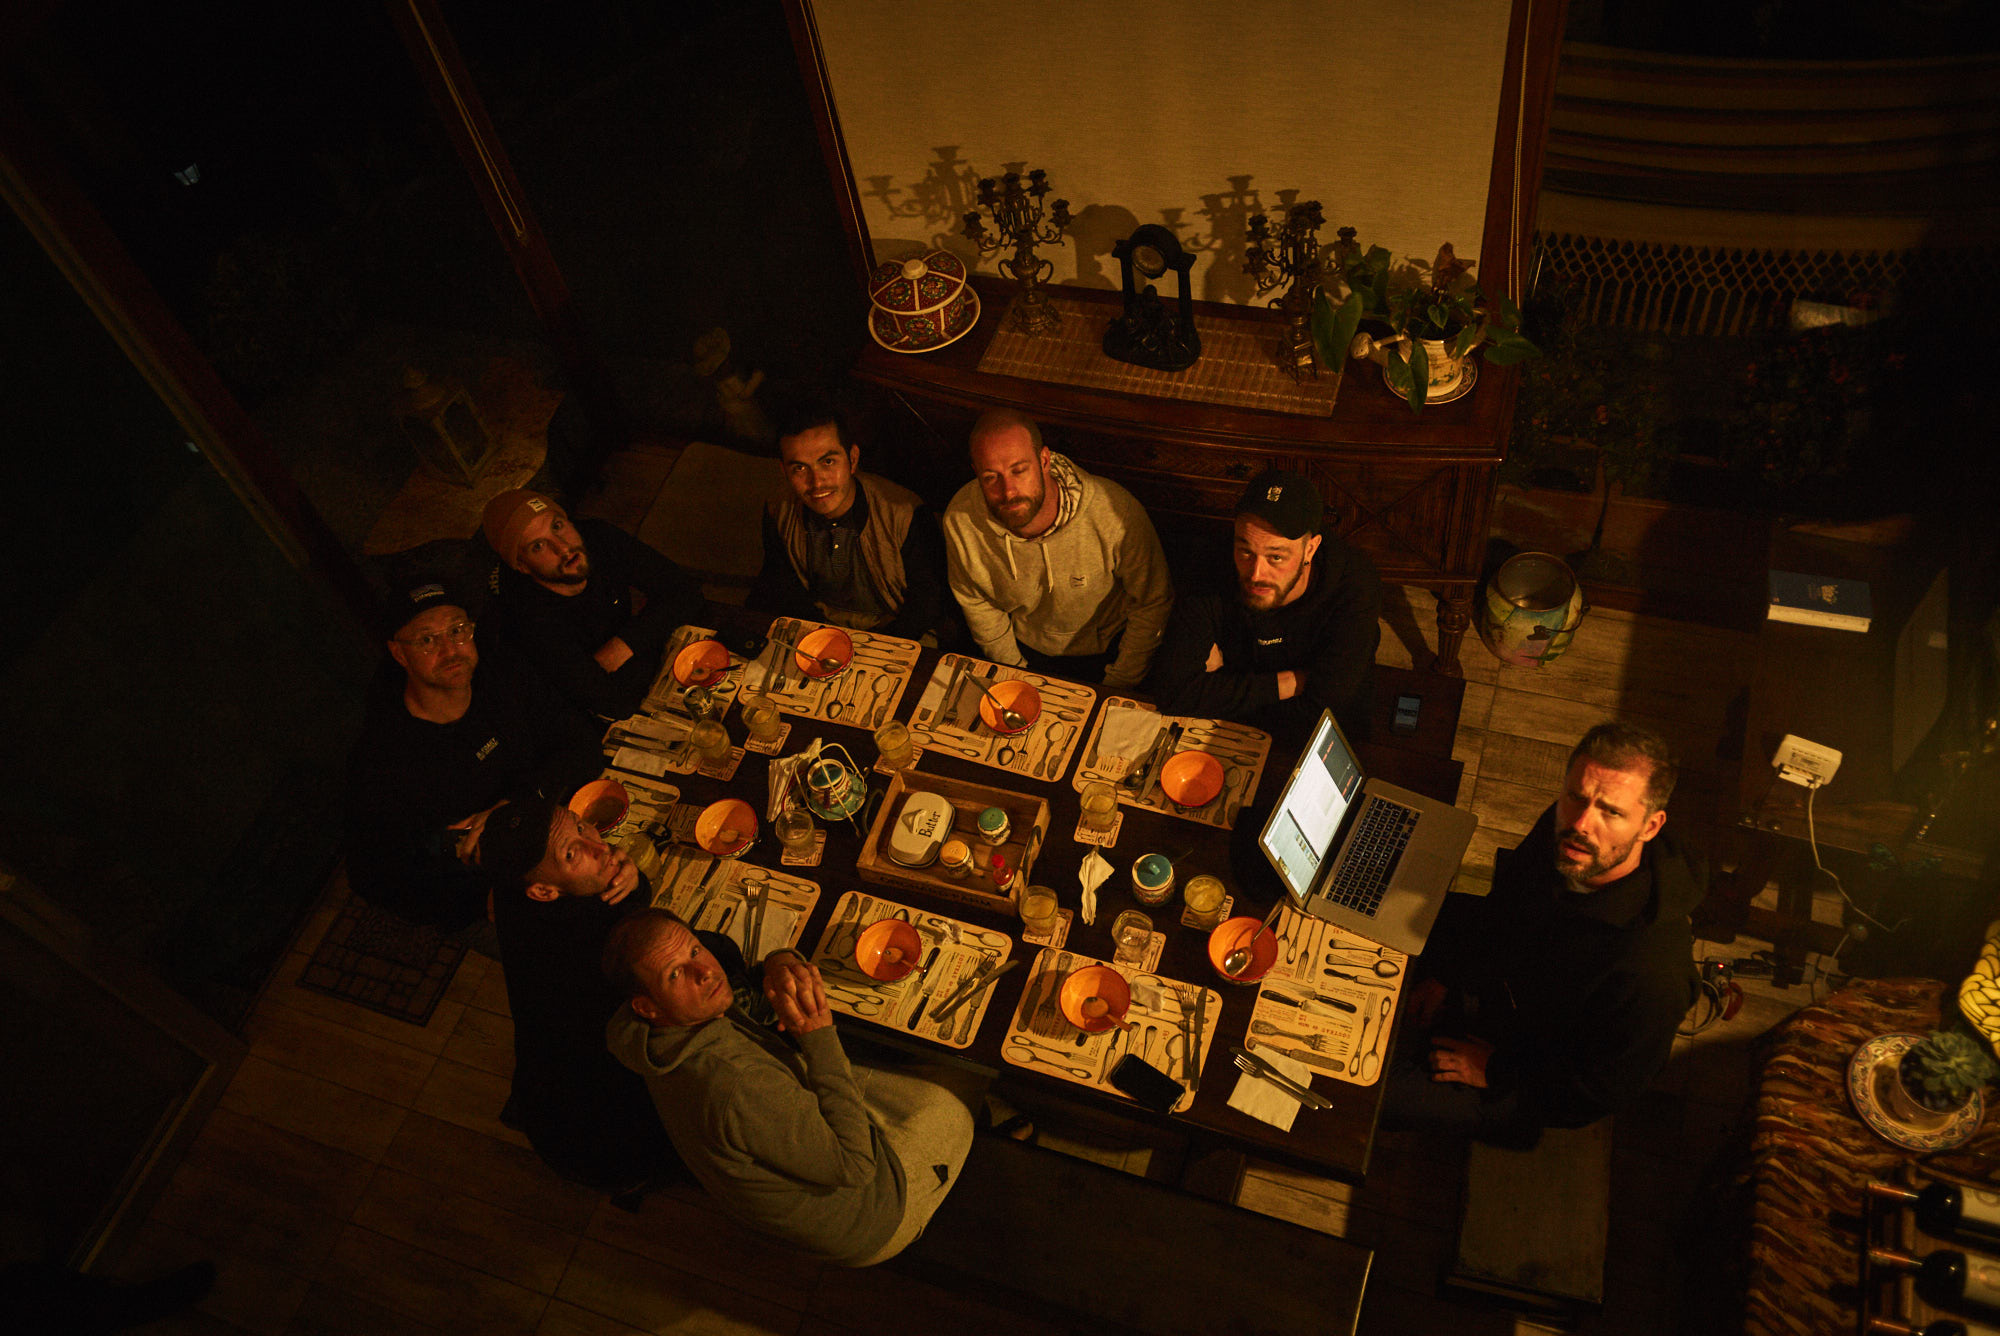 LOWRES-RADRACE-COLUMBIA-2018-CARLOS-2557.jpg